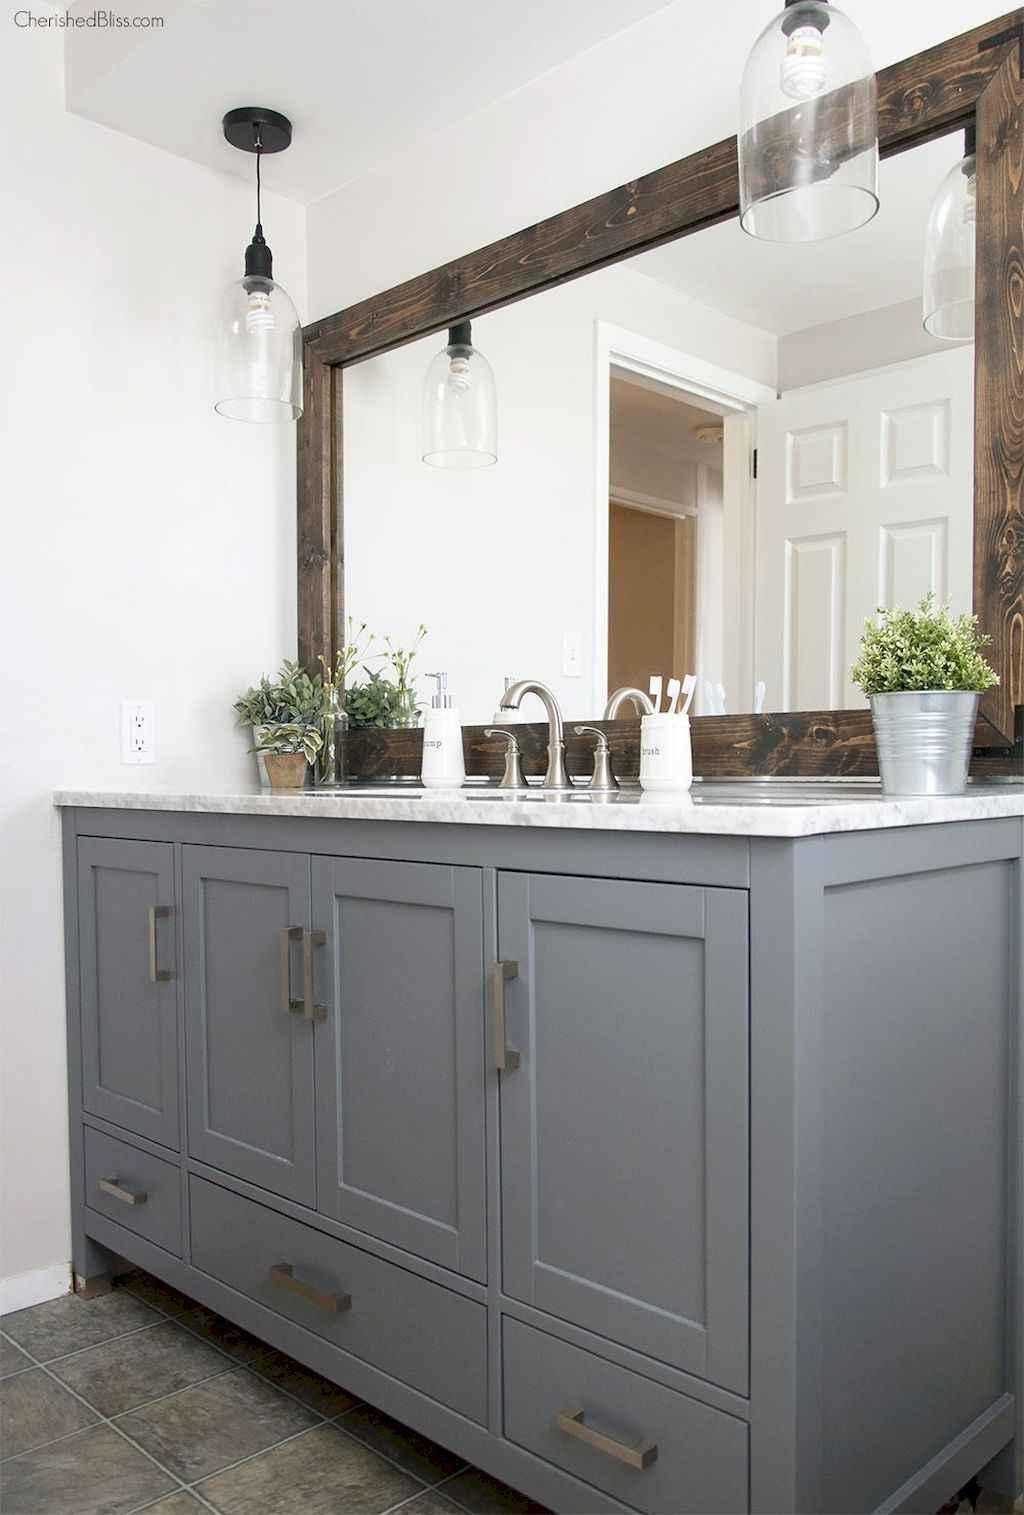 125 awesome farmhouse bathroom vanity remodel ideas (83)